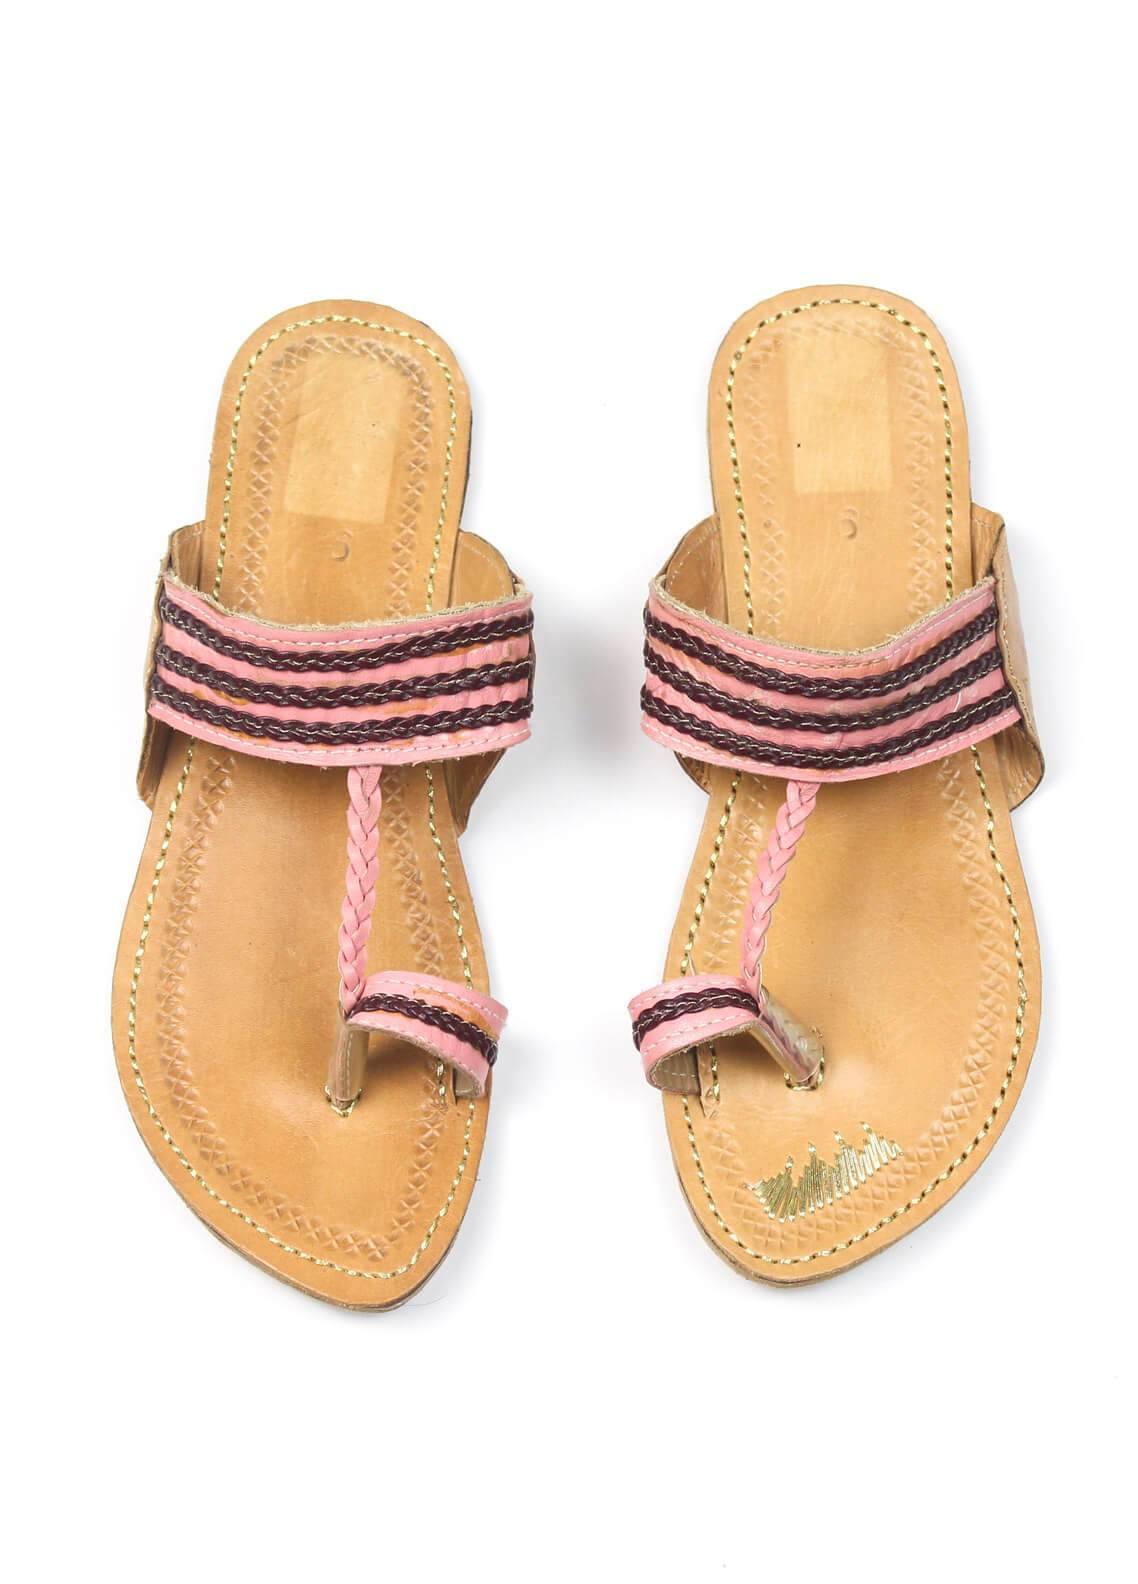 Silk Avenue Kolapuri Style Leather Flat Shoes SAF09-Pink